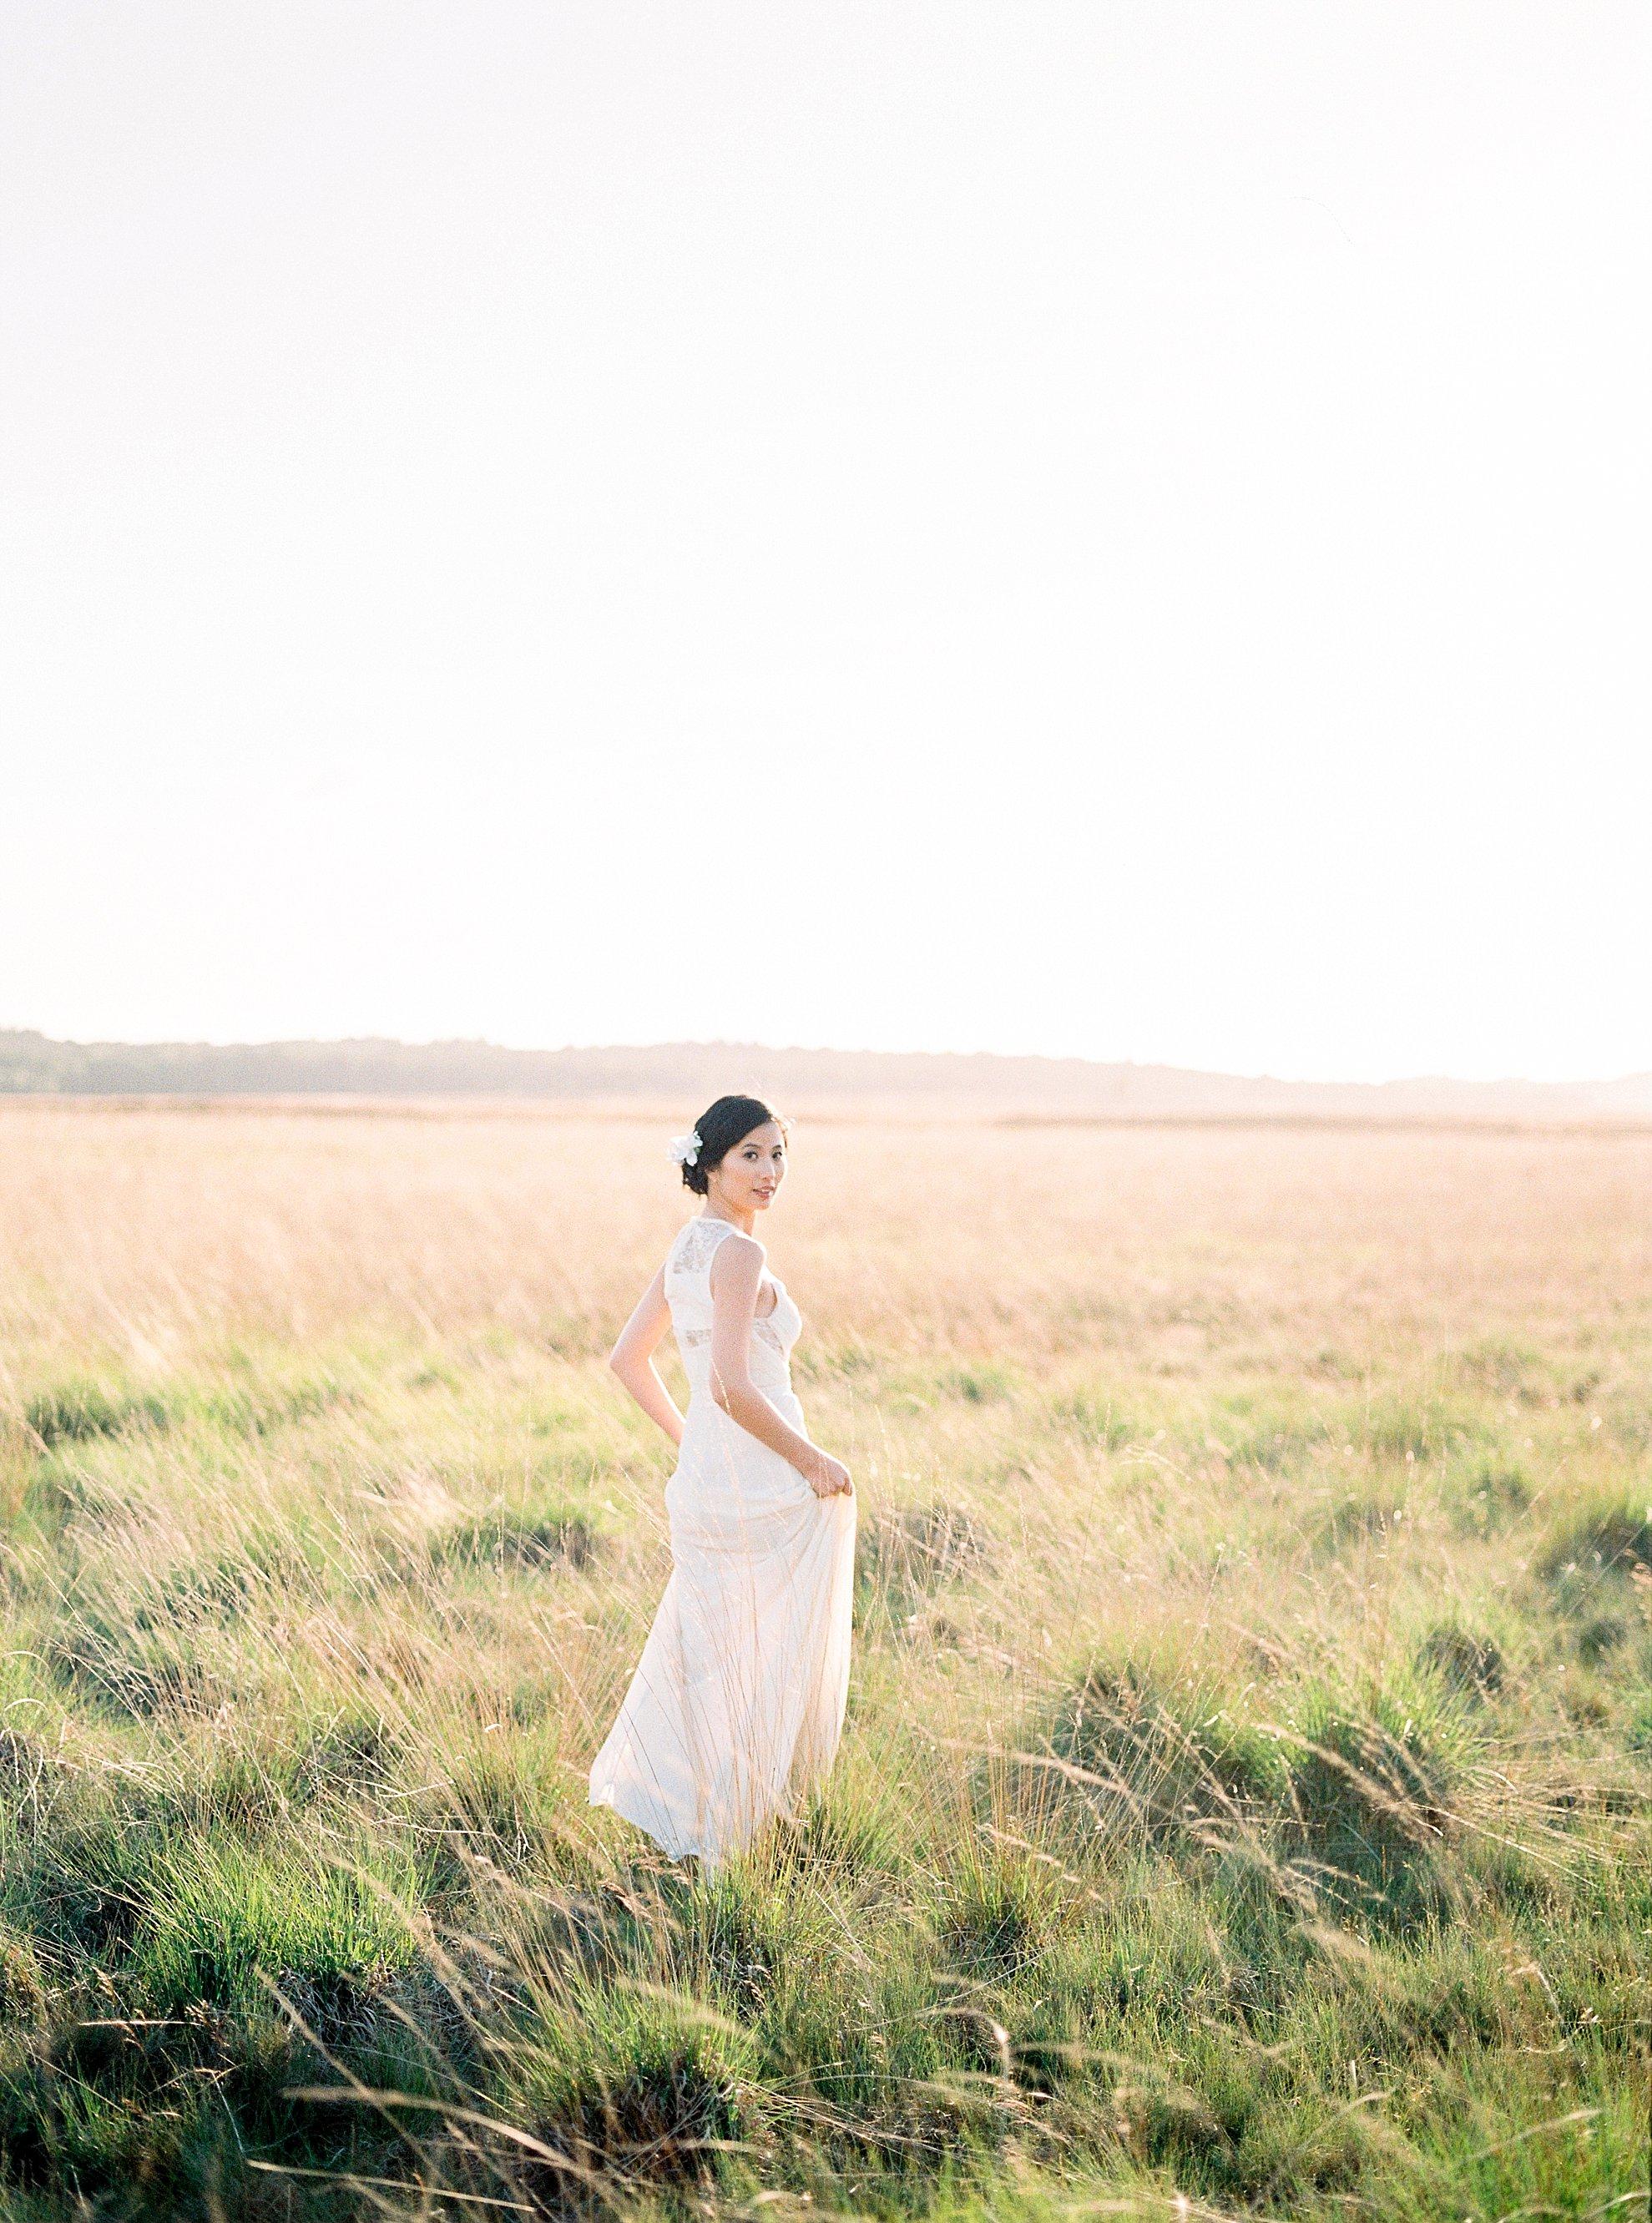 Amanda-Drost-Fine-art-photography-film-fotografie-analoog_0287.jpg